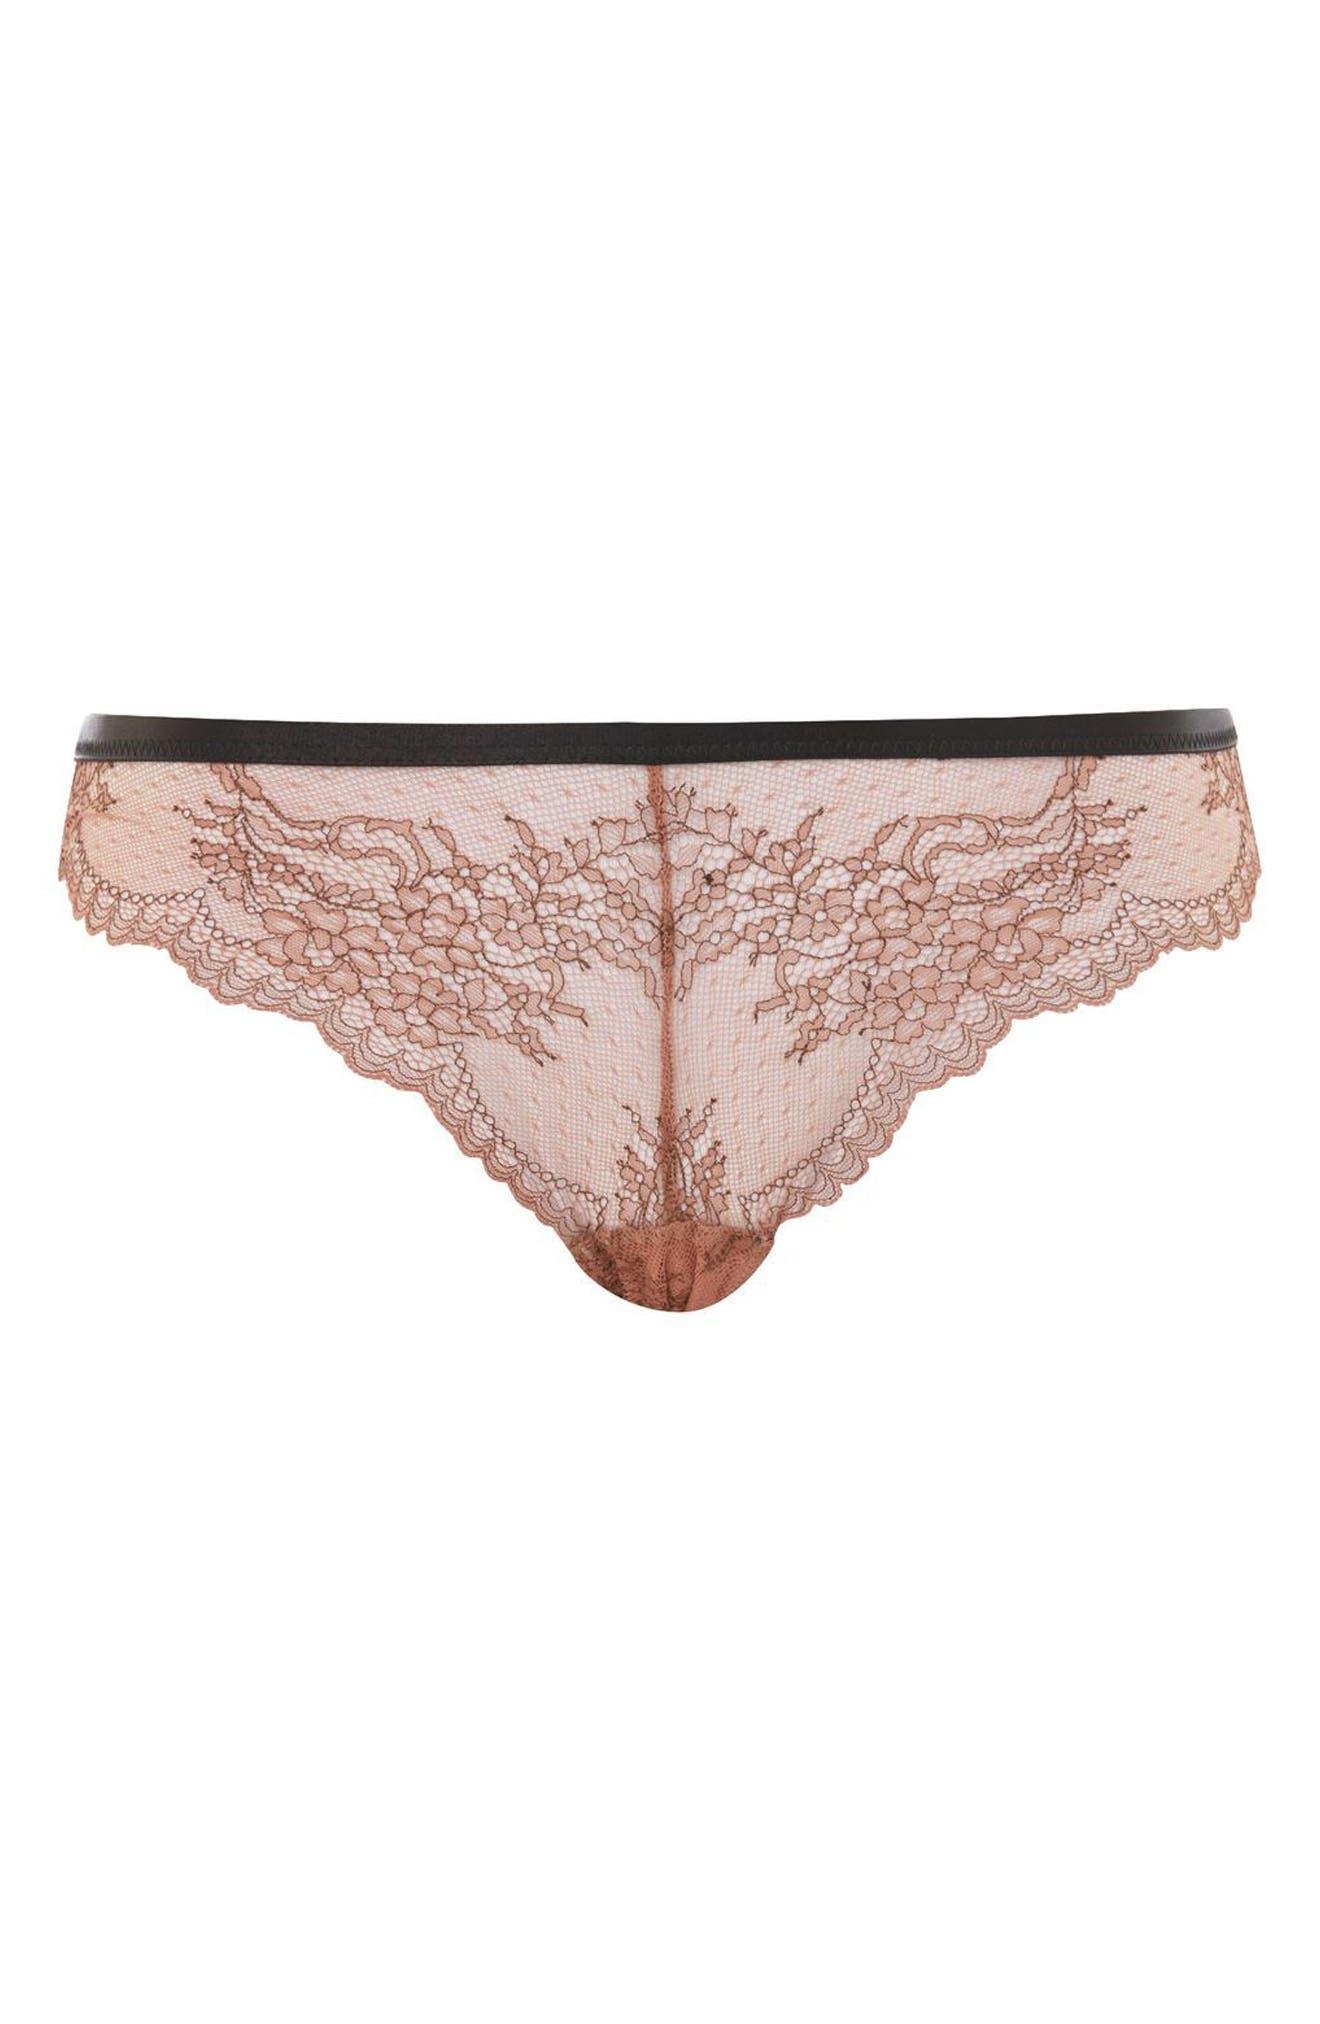 Topshop Lila Lace Brazilian Panties